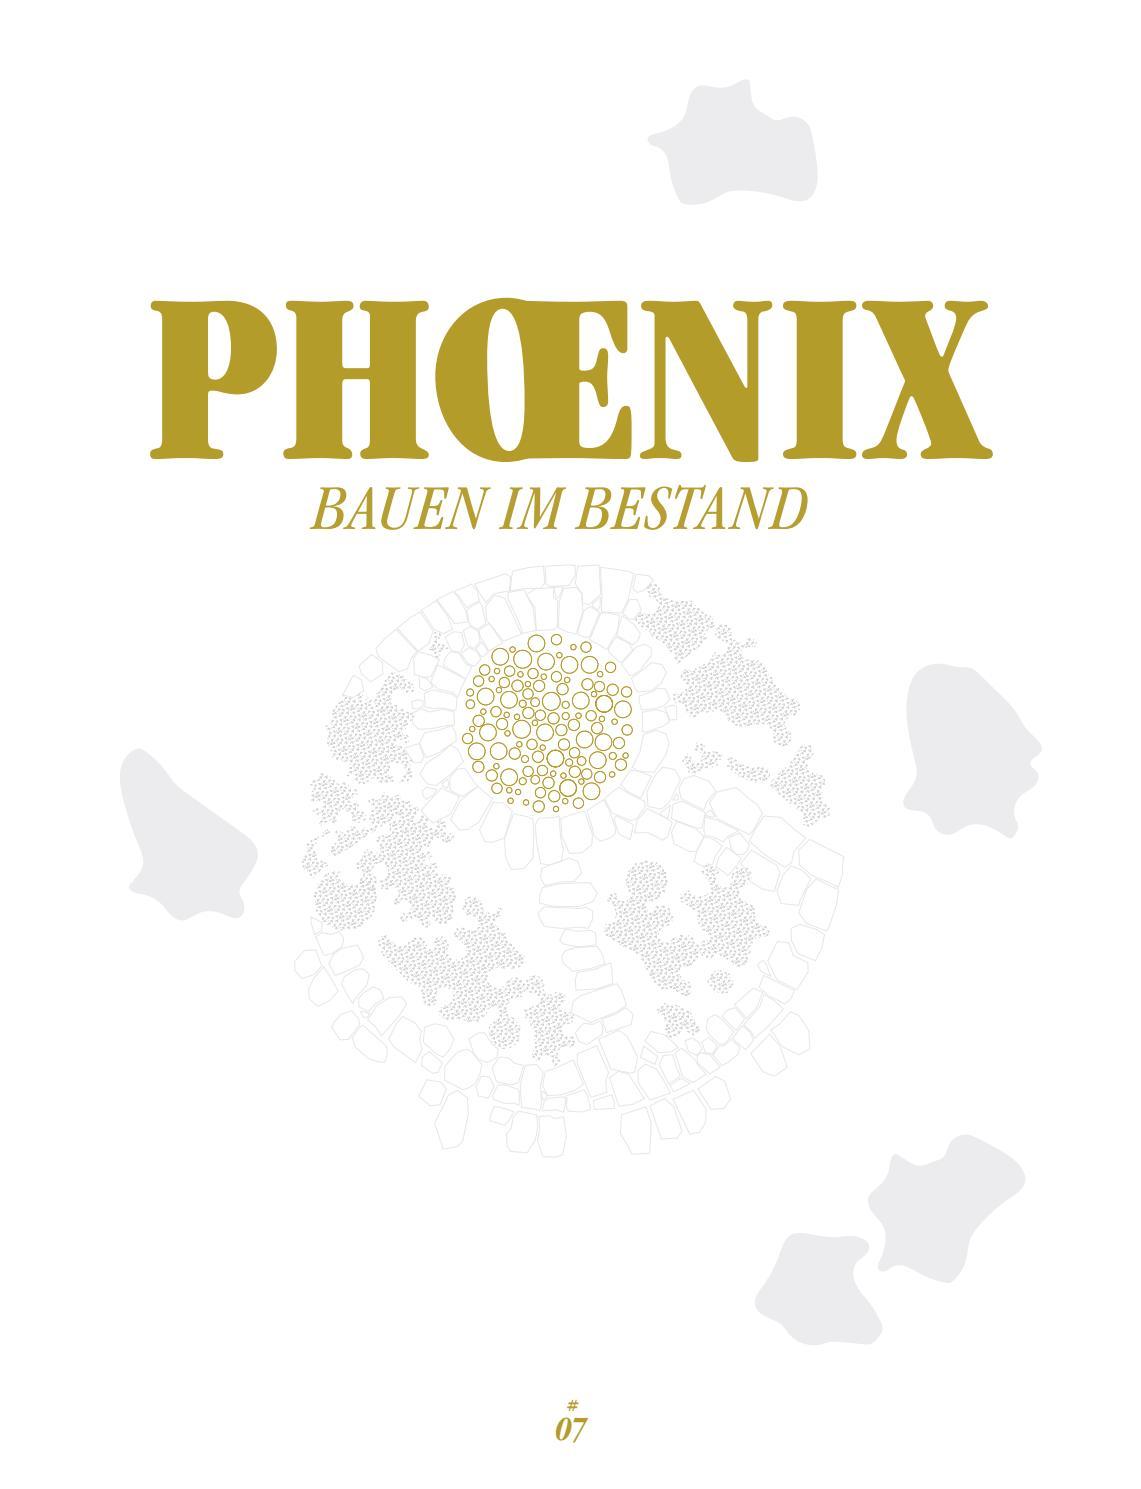 Phoenix 03 2016 by BL Verlag AG - issuu